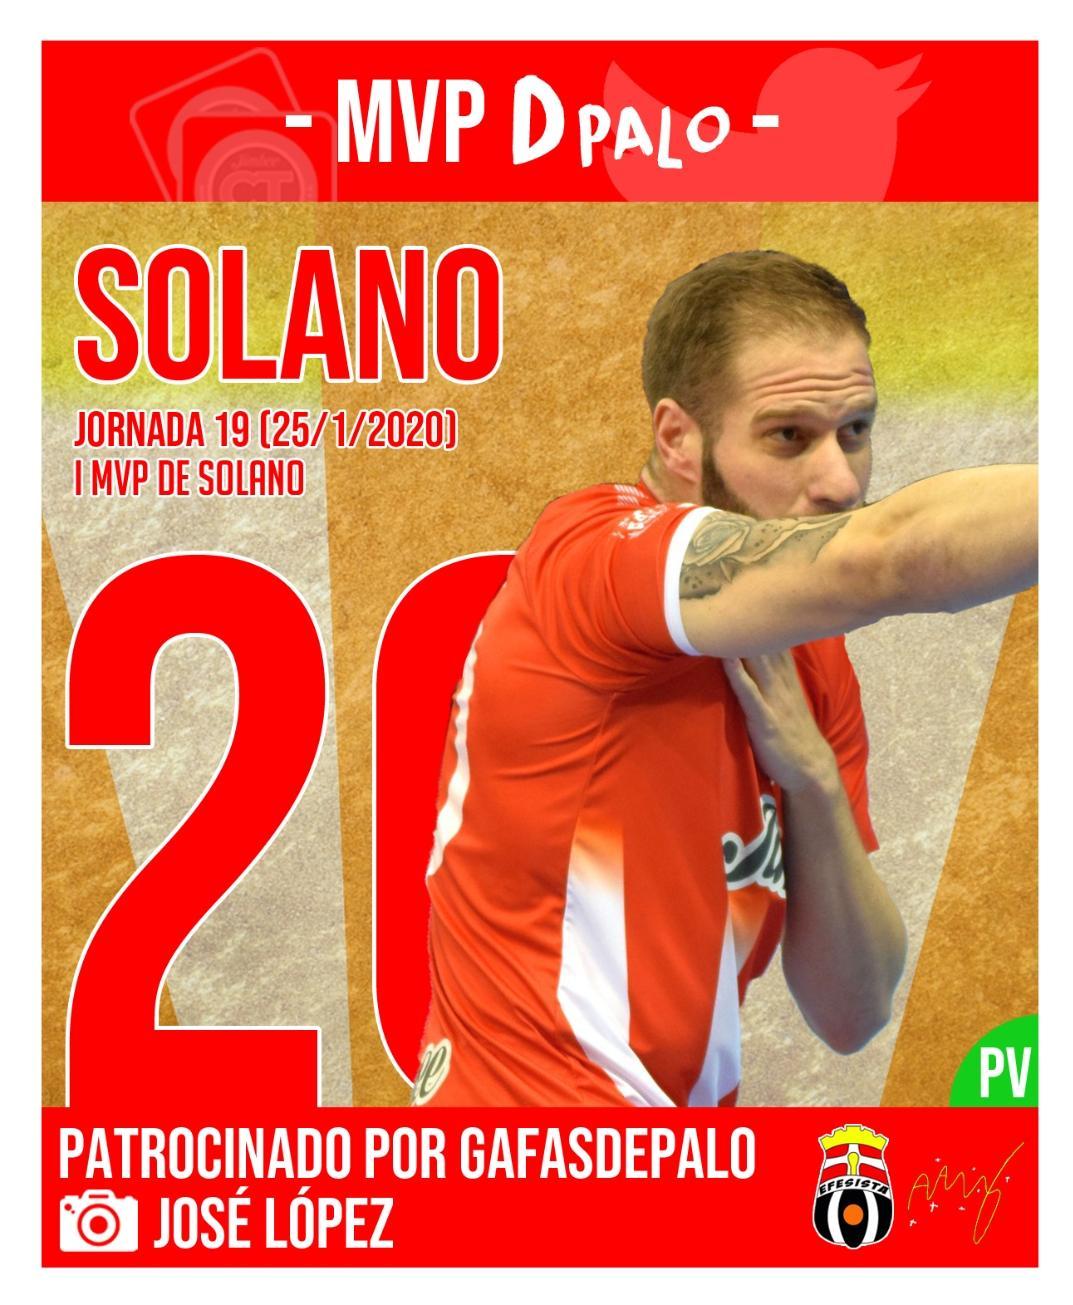 Solano MVP